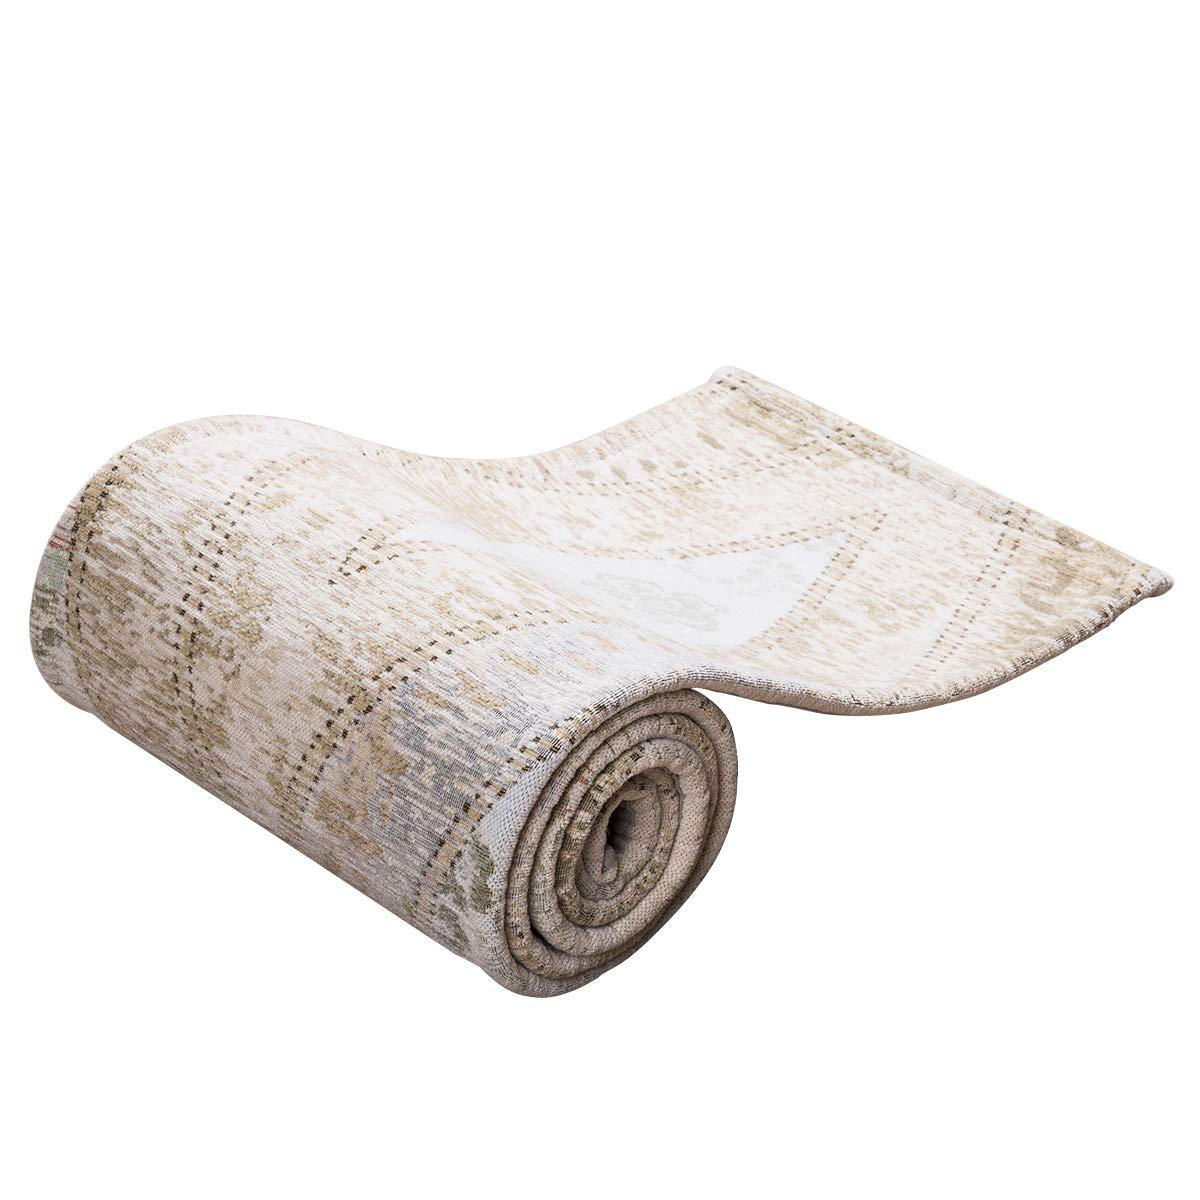 AMIDA Classical Vintage Design Area Rug for Home Floor Covering Runner Washable Beige